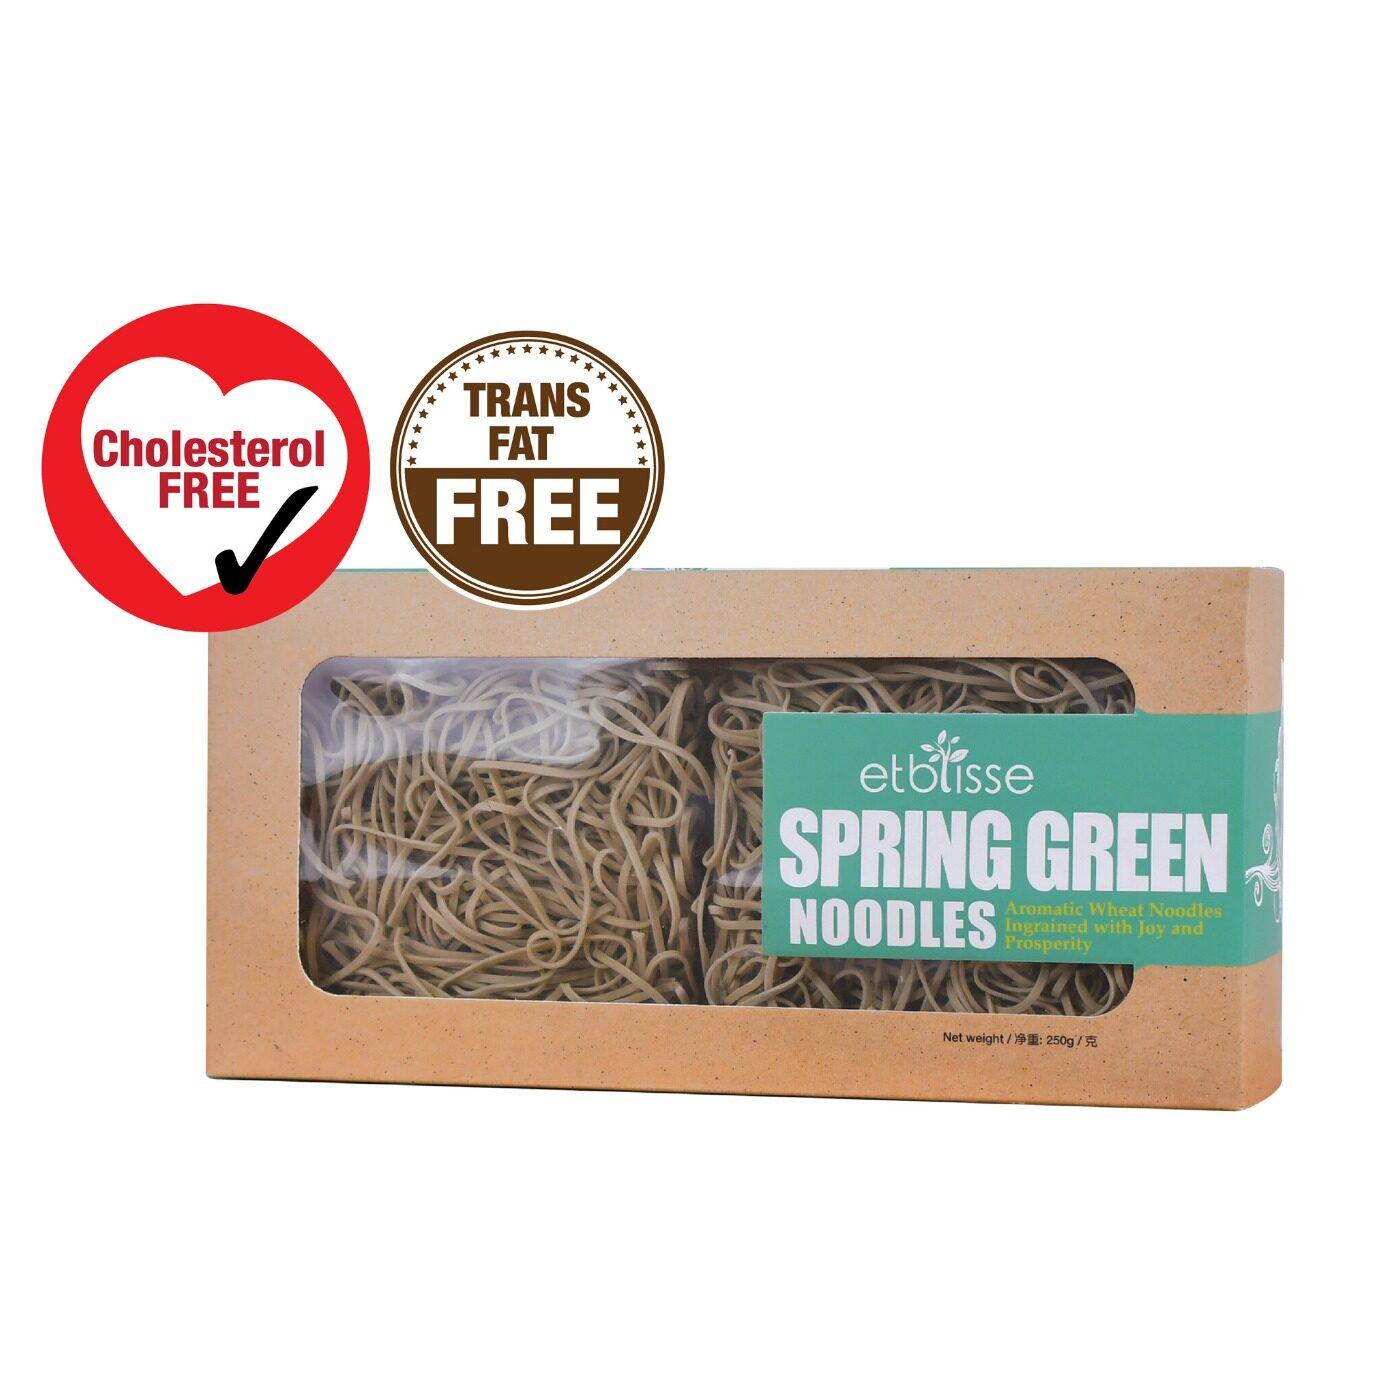 Etblisse Spring Green Noodles, 250g (4 pieces x 62.5g)